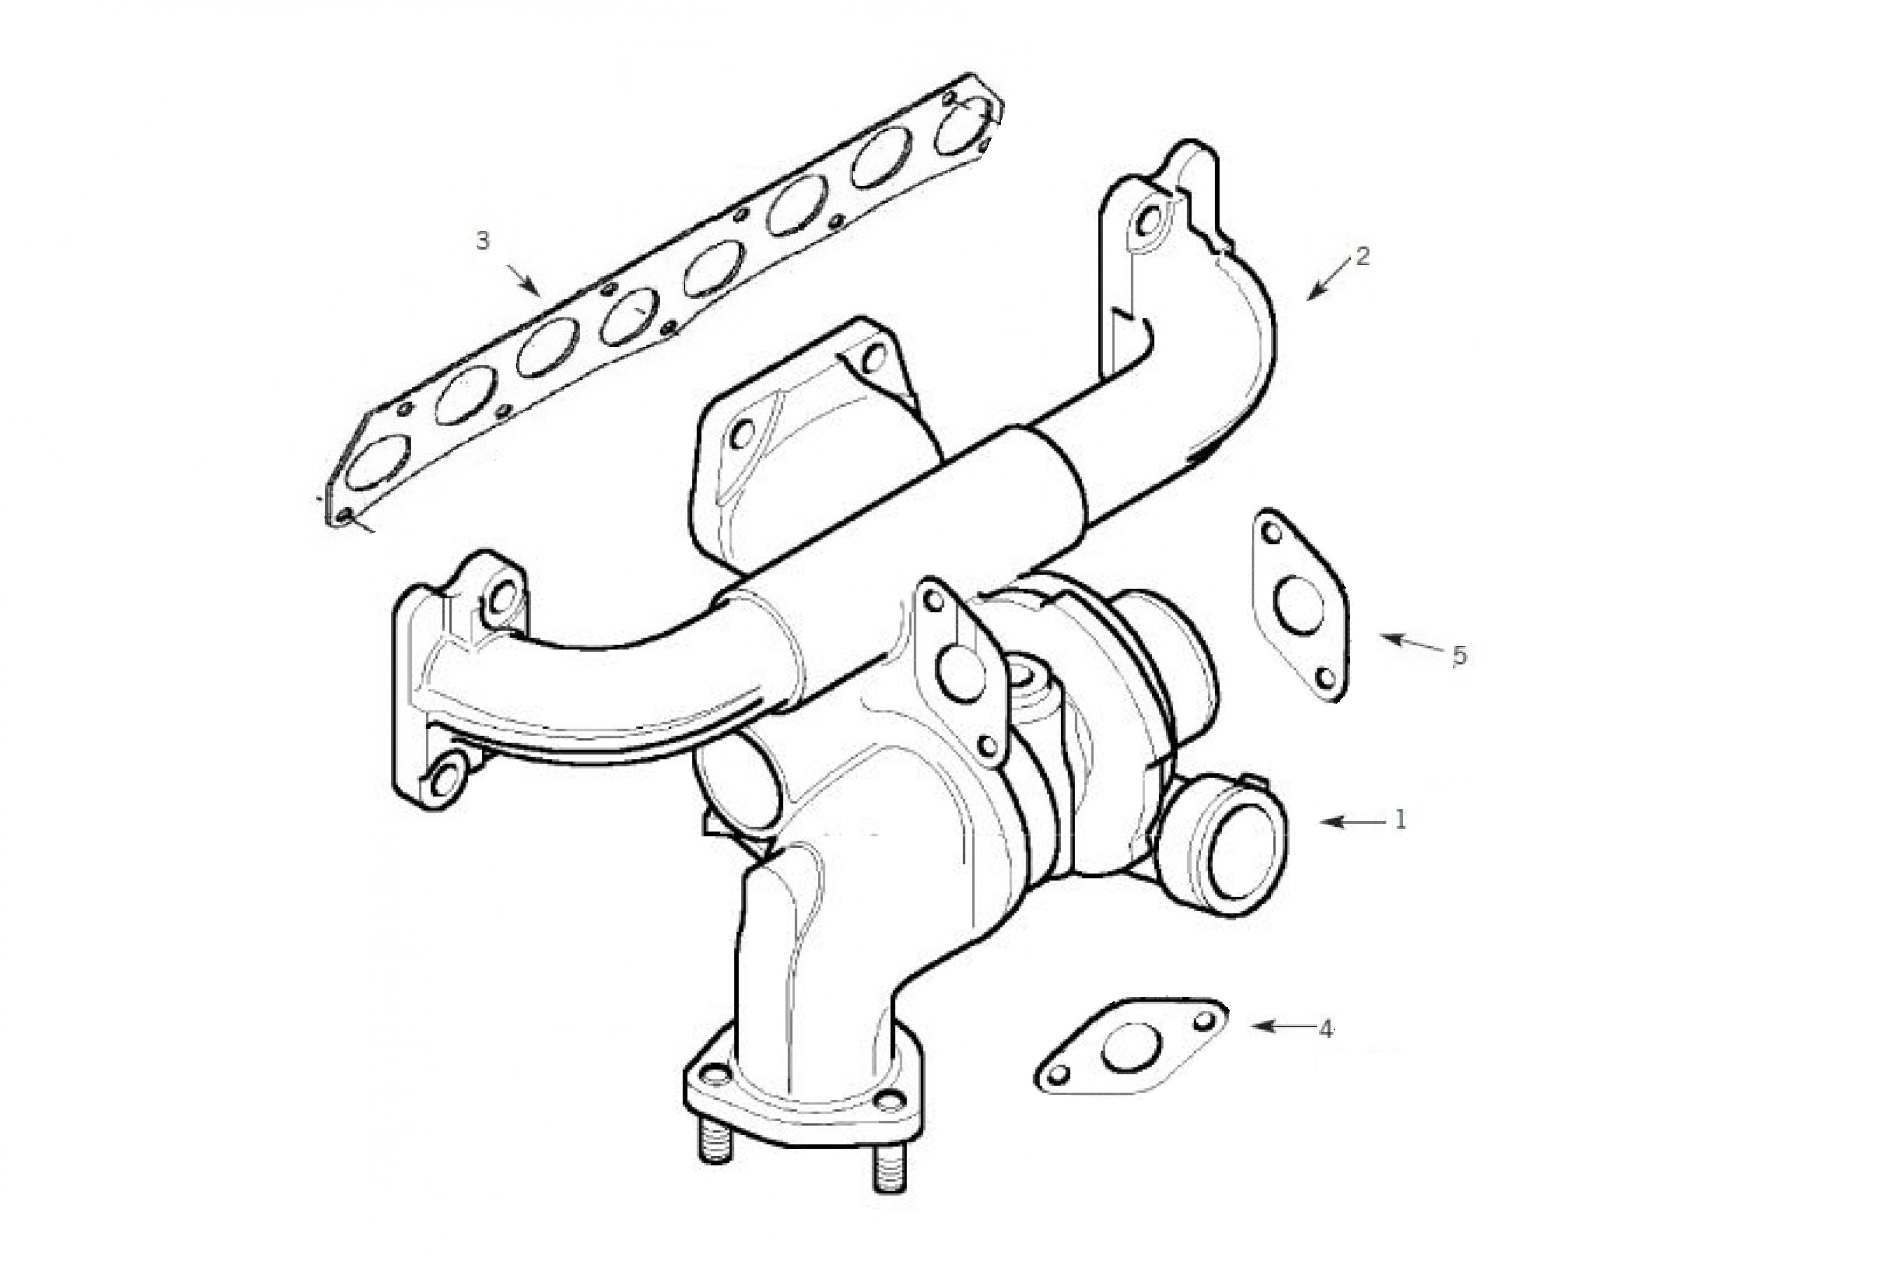 lr parts accessories html